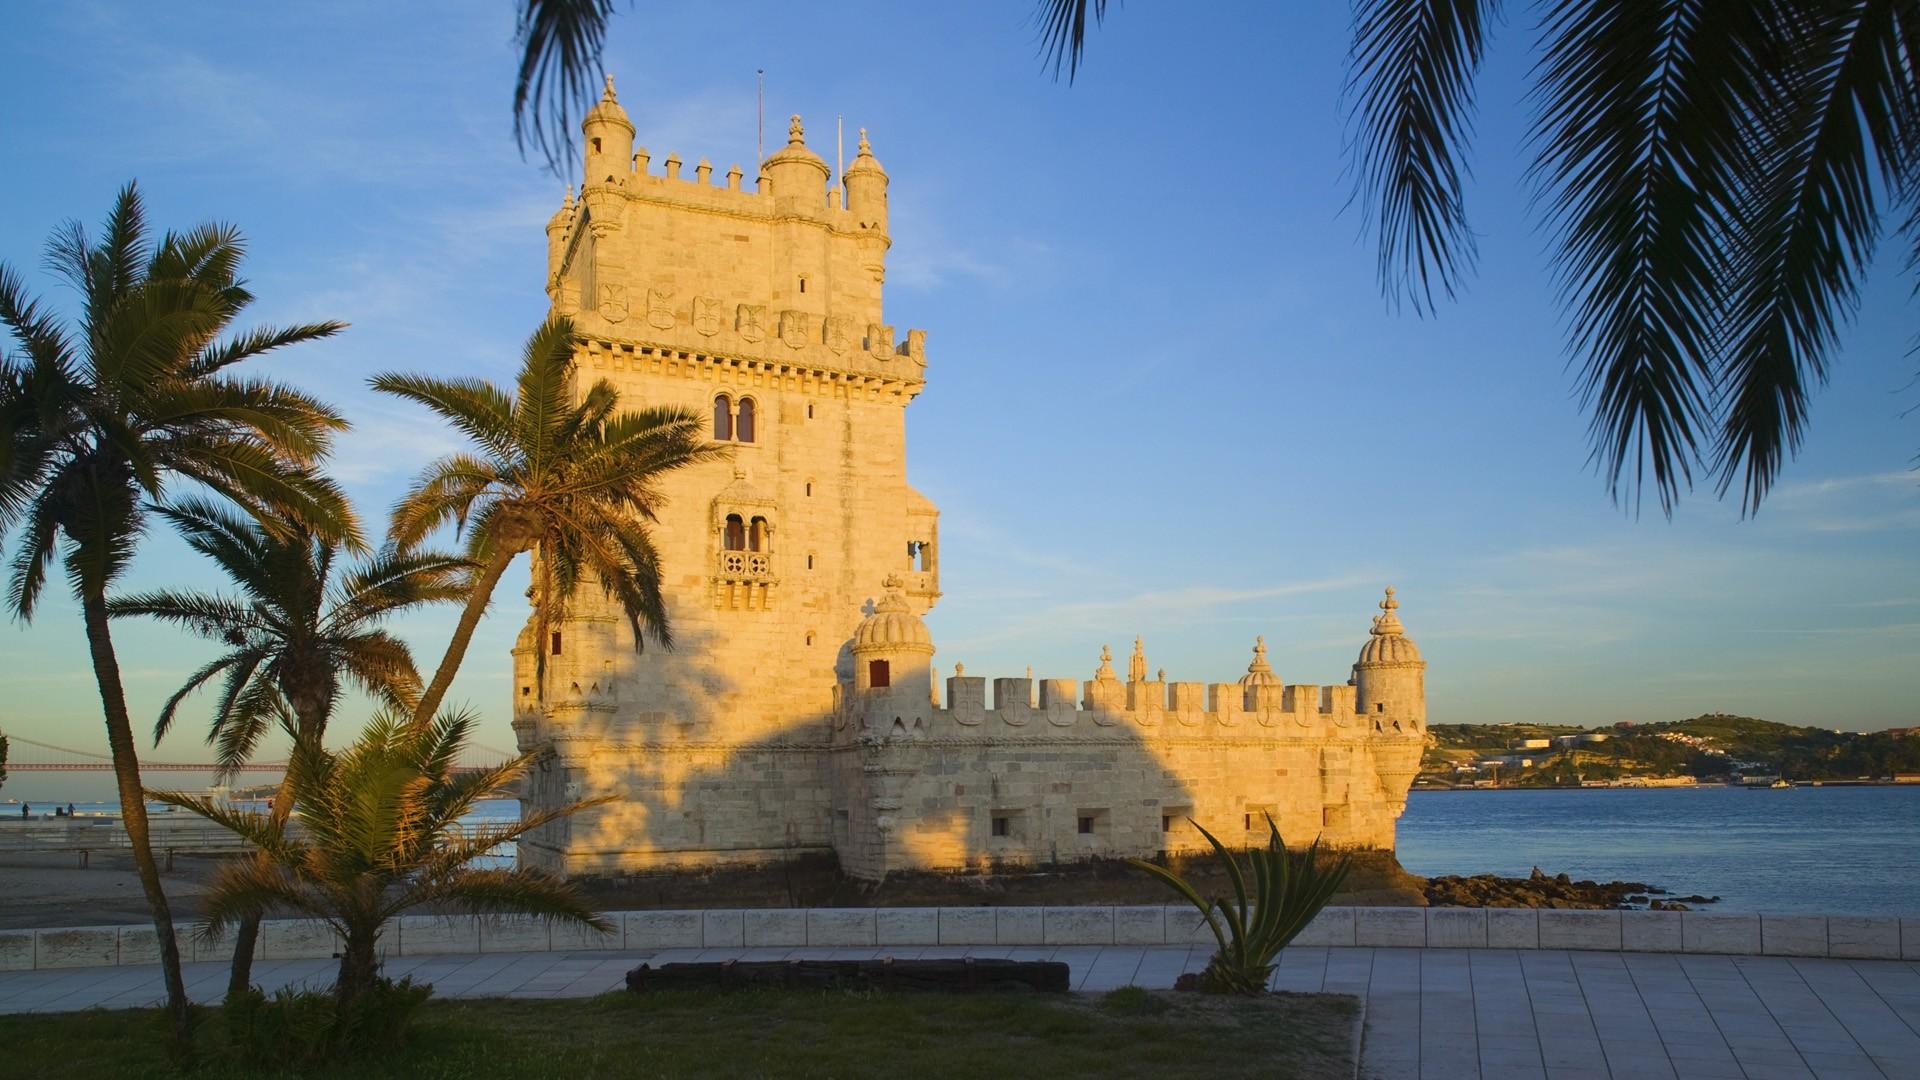 lisbon-portugal-mural-tower-1920x1080-wallpaper111058